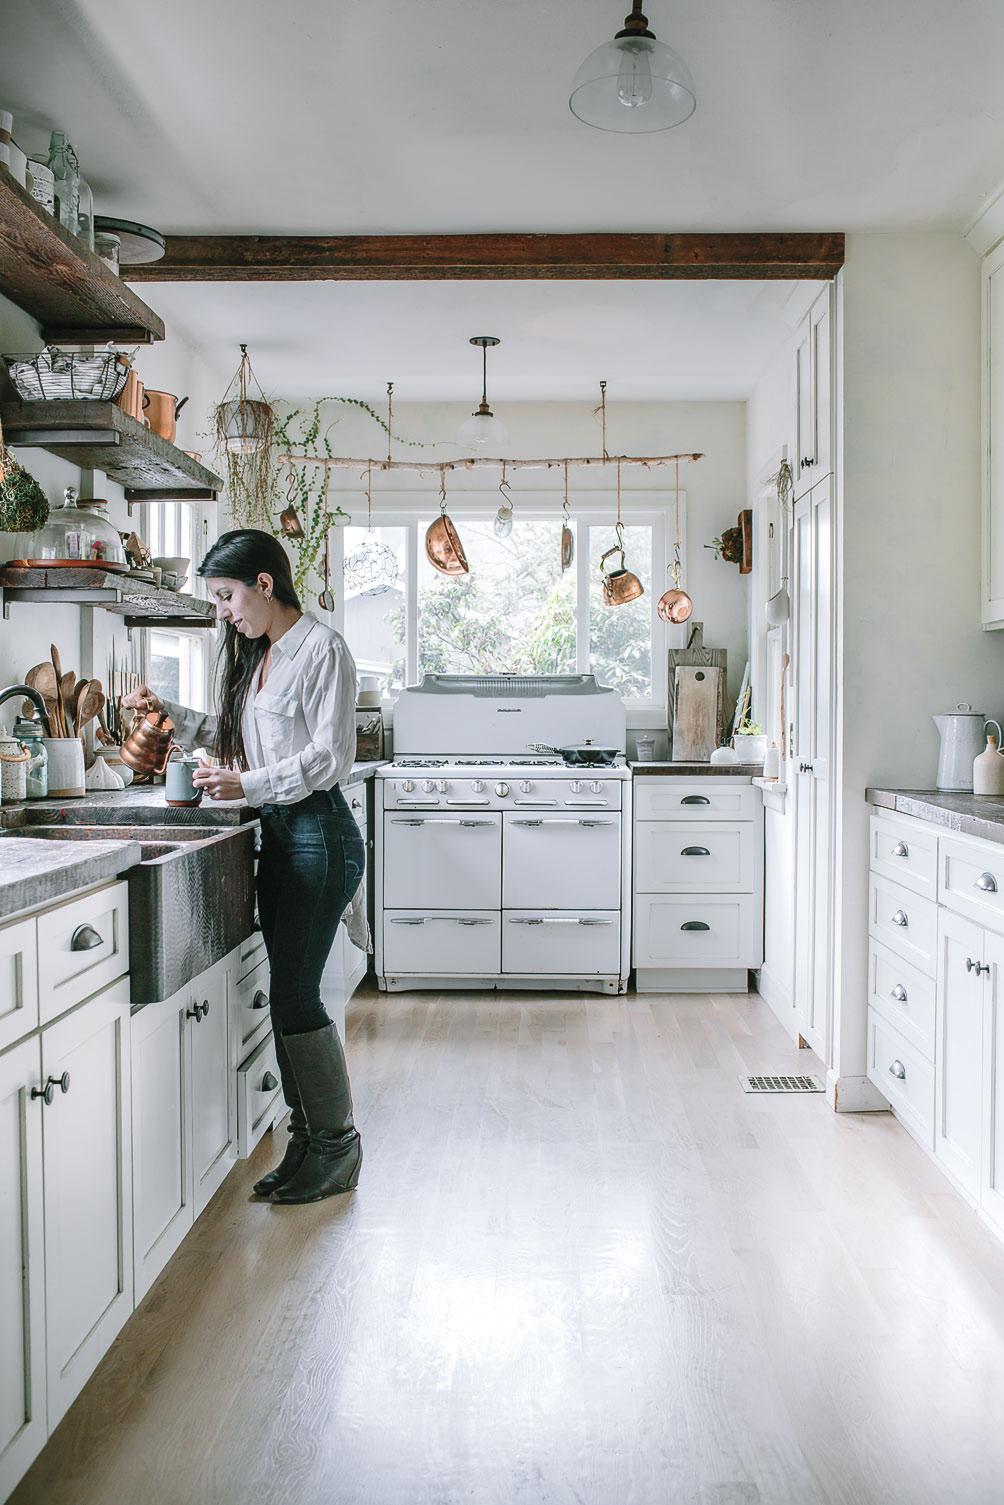 small kitchen ideas for design & organization - sunset